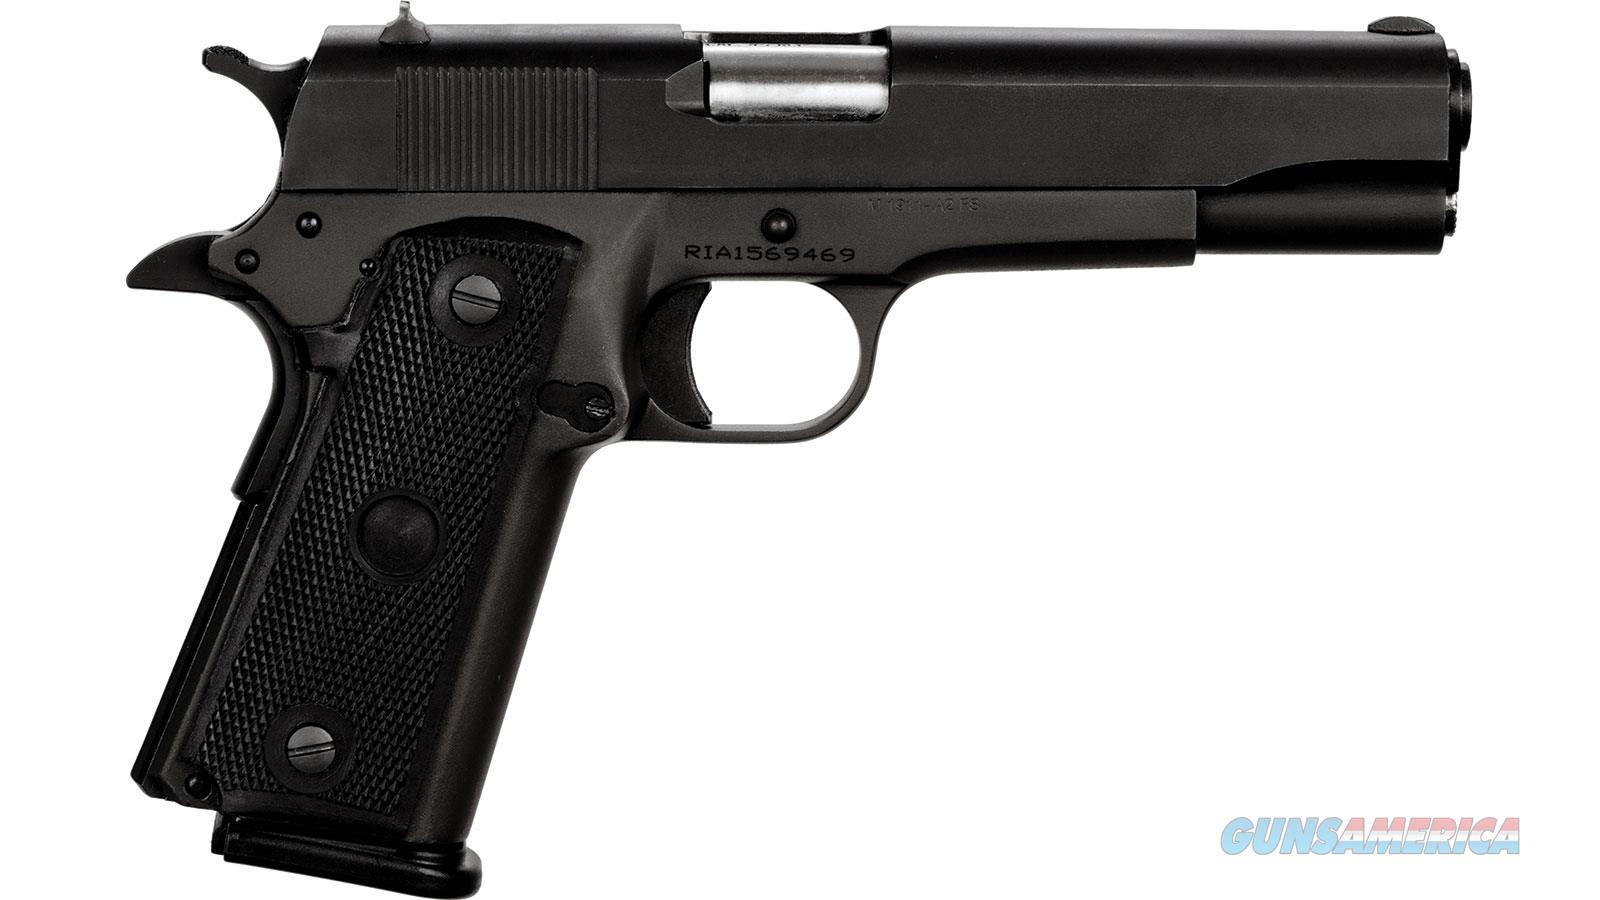 M1911-A2 Fsp Gi Series 51453  Guns > Pistols > A Misc Pistols